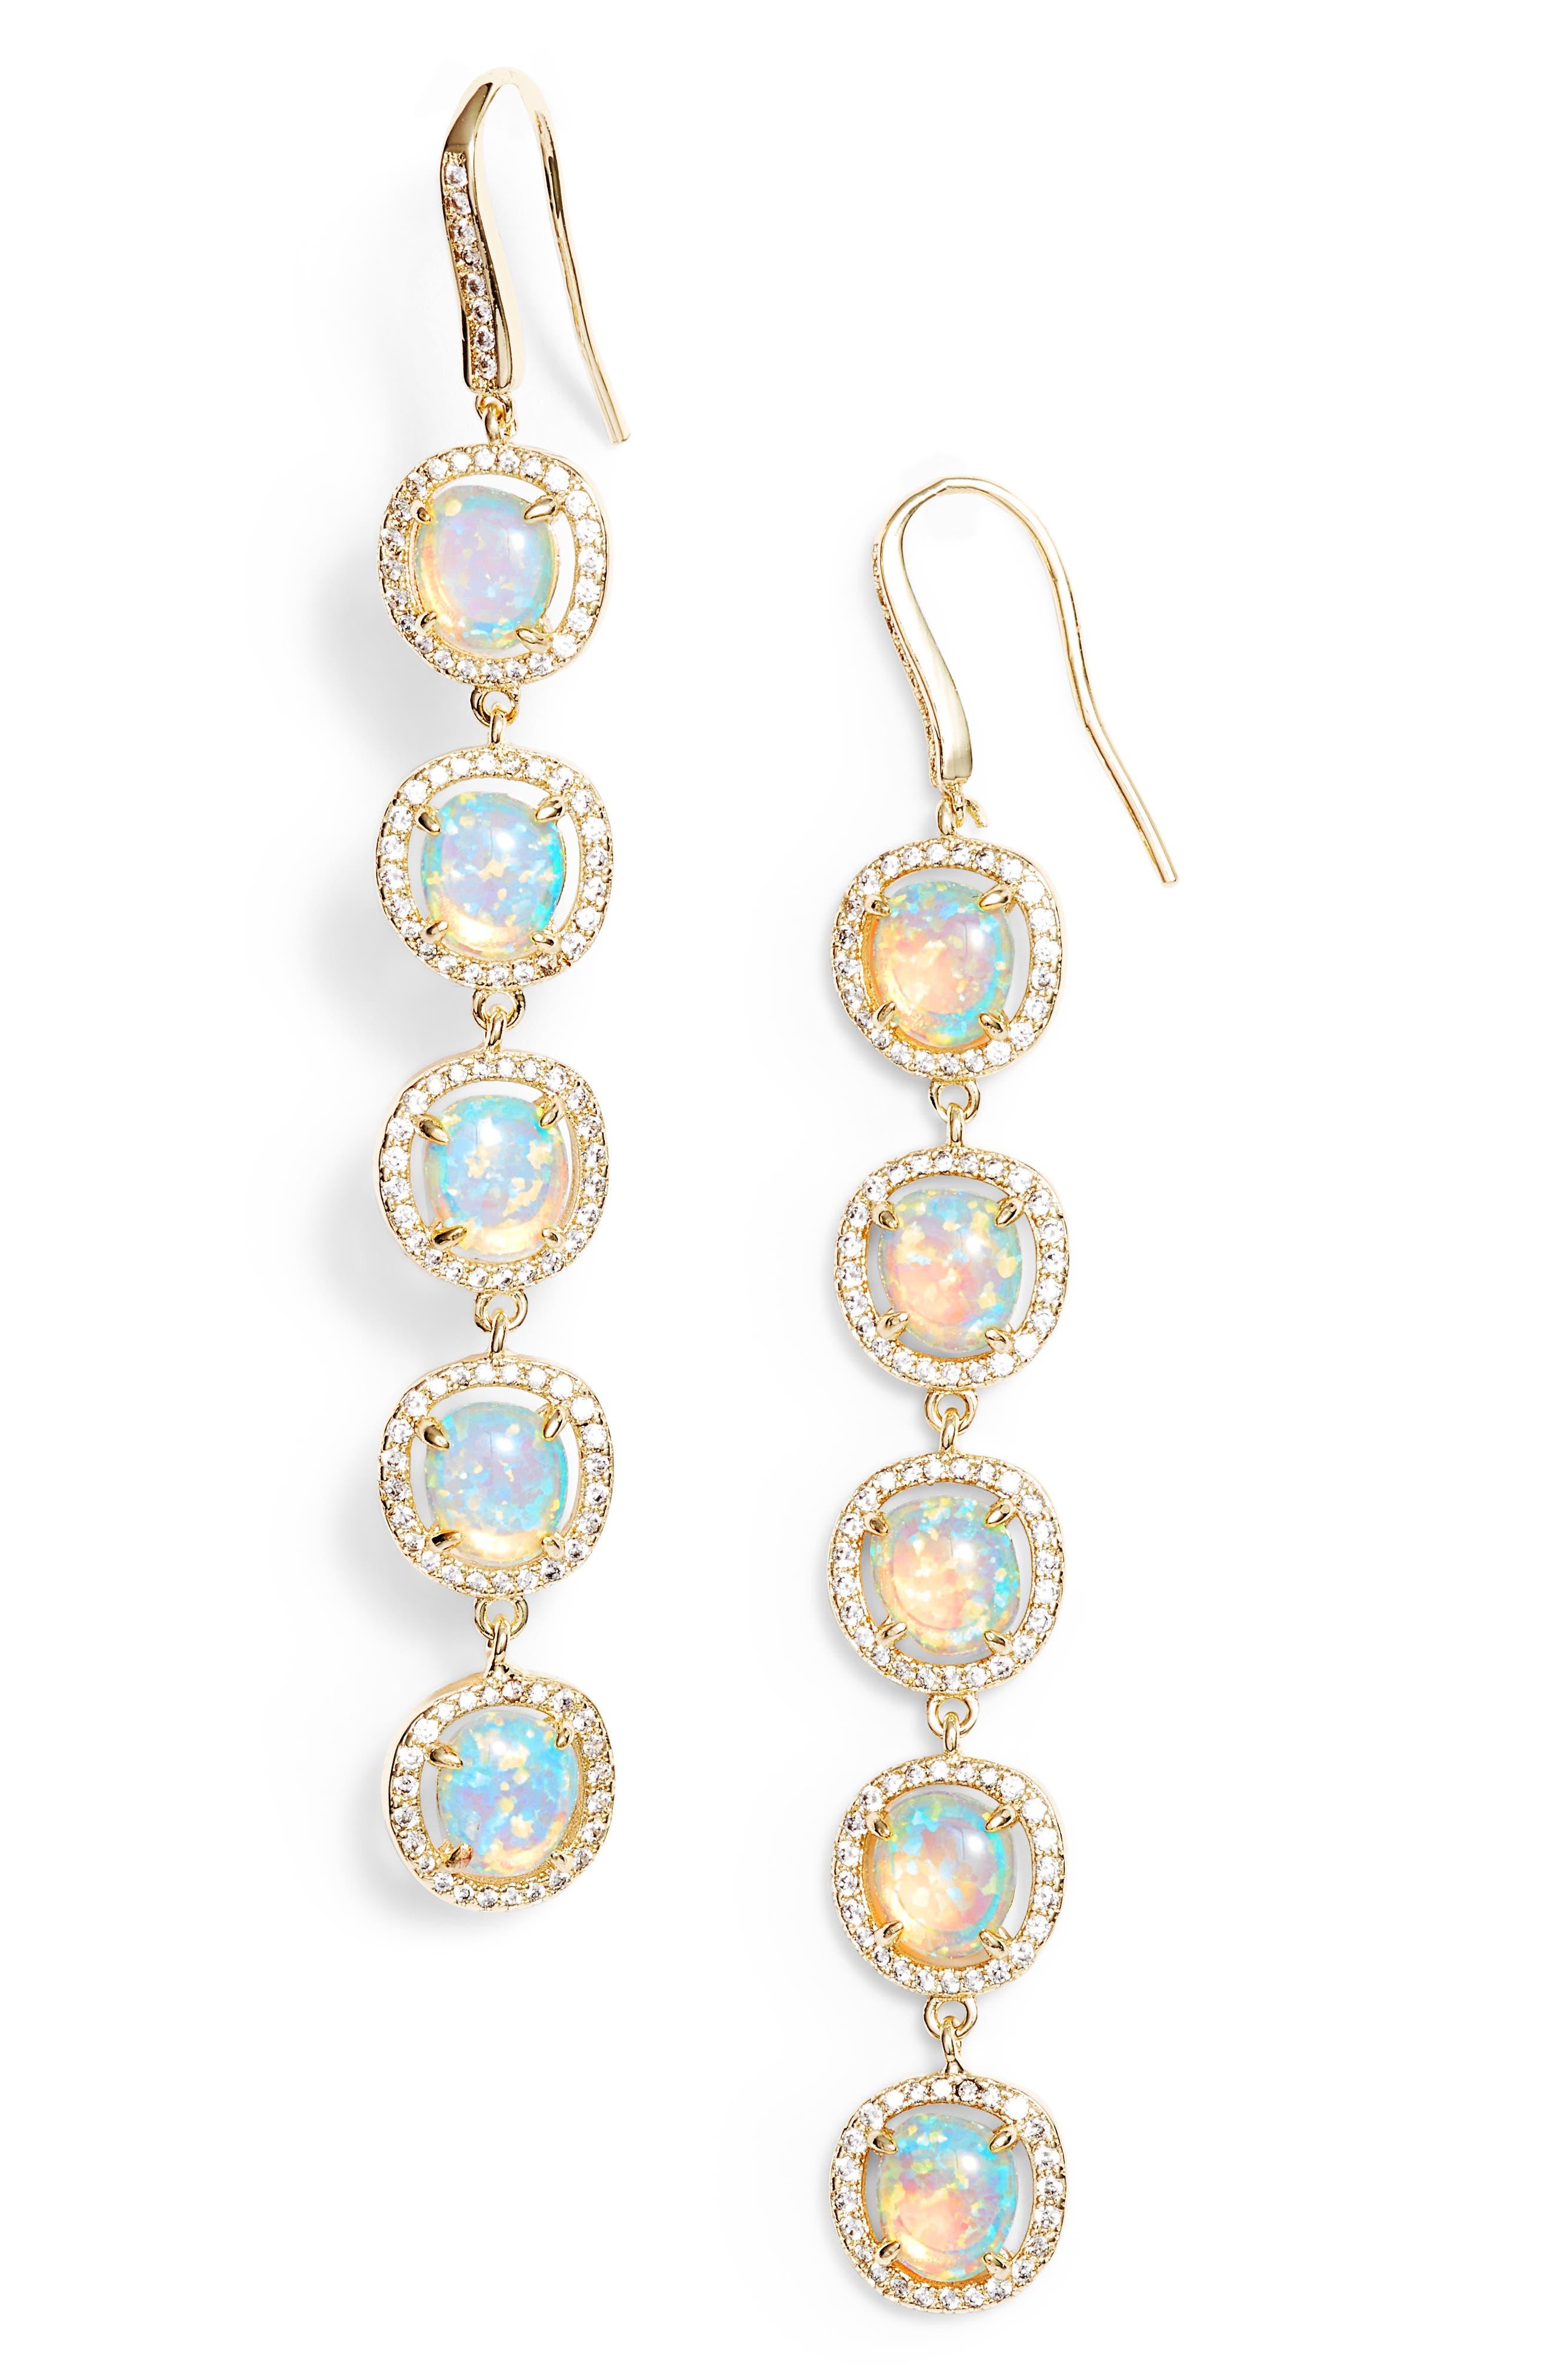 Meredith Opal & Crystal Drop Earrings,                             Main thumbnail 1, color,                             400